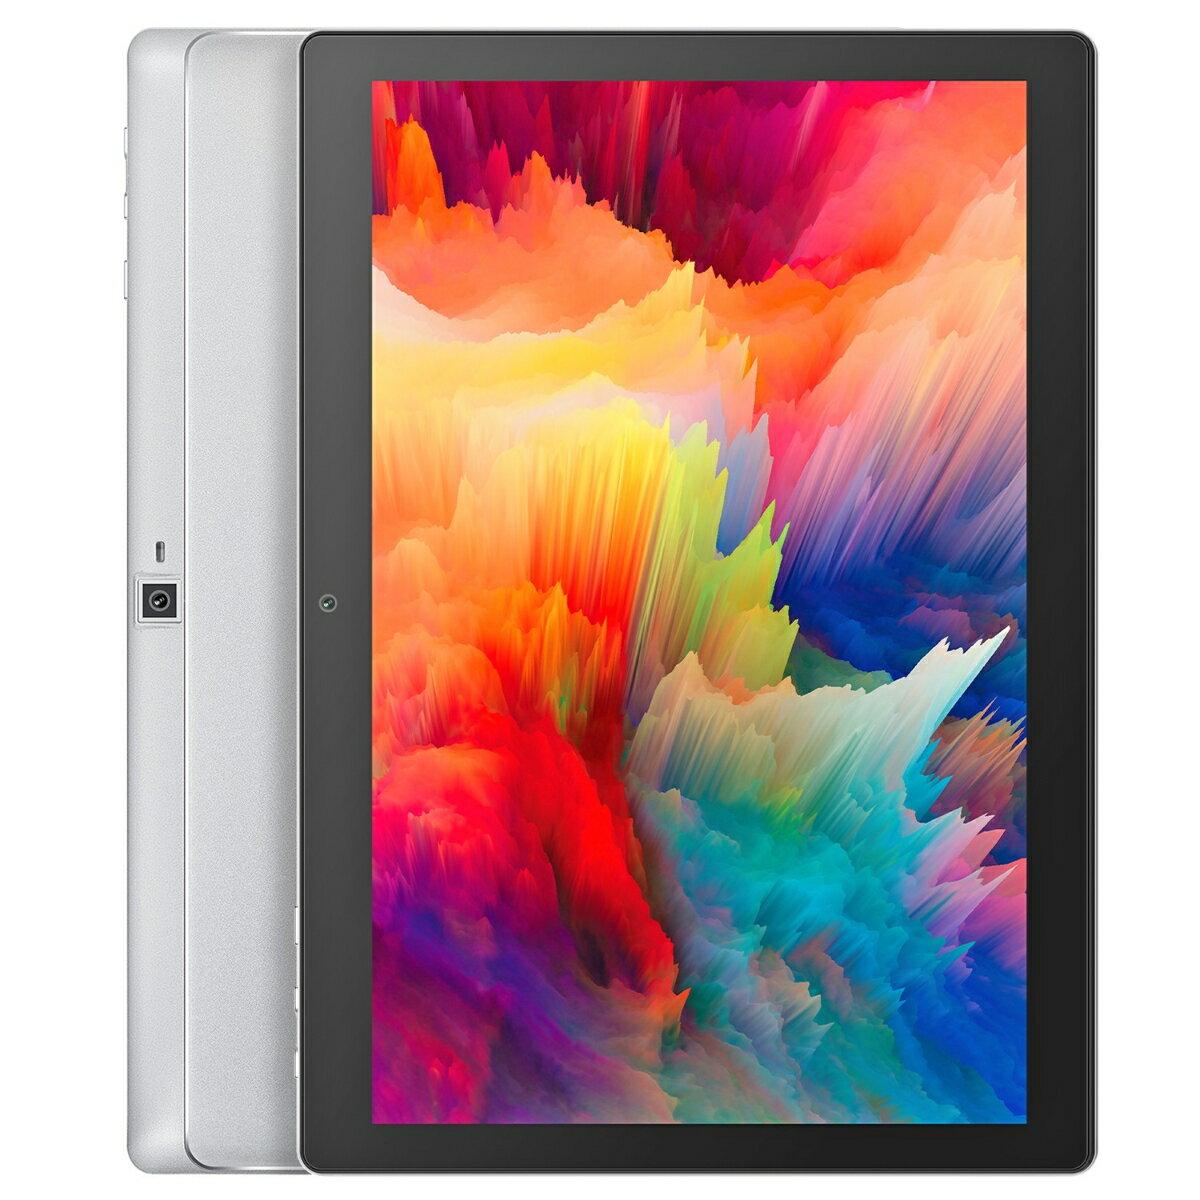 VANKYO MatrixPad S30T (64G) 10 inch Tablet (Silver)